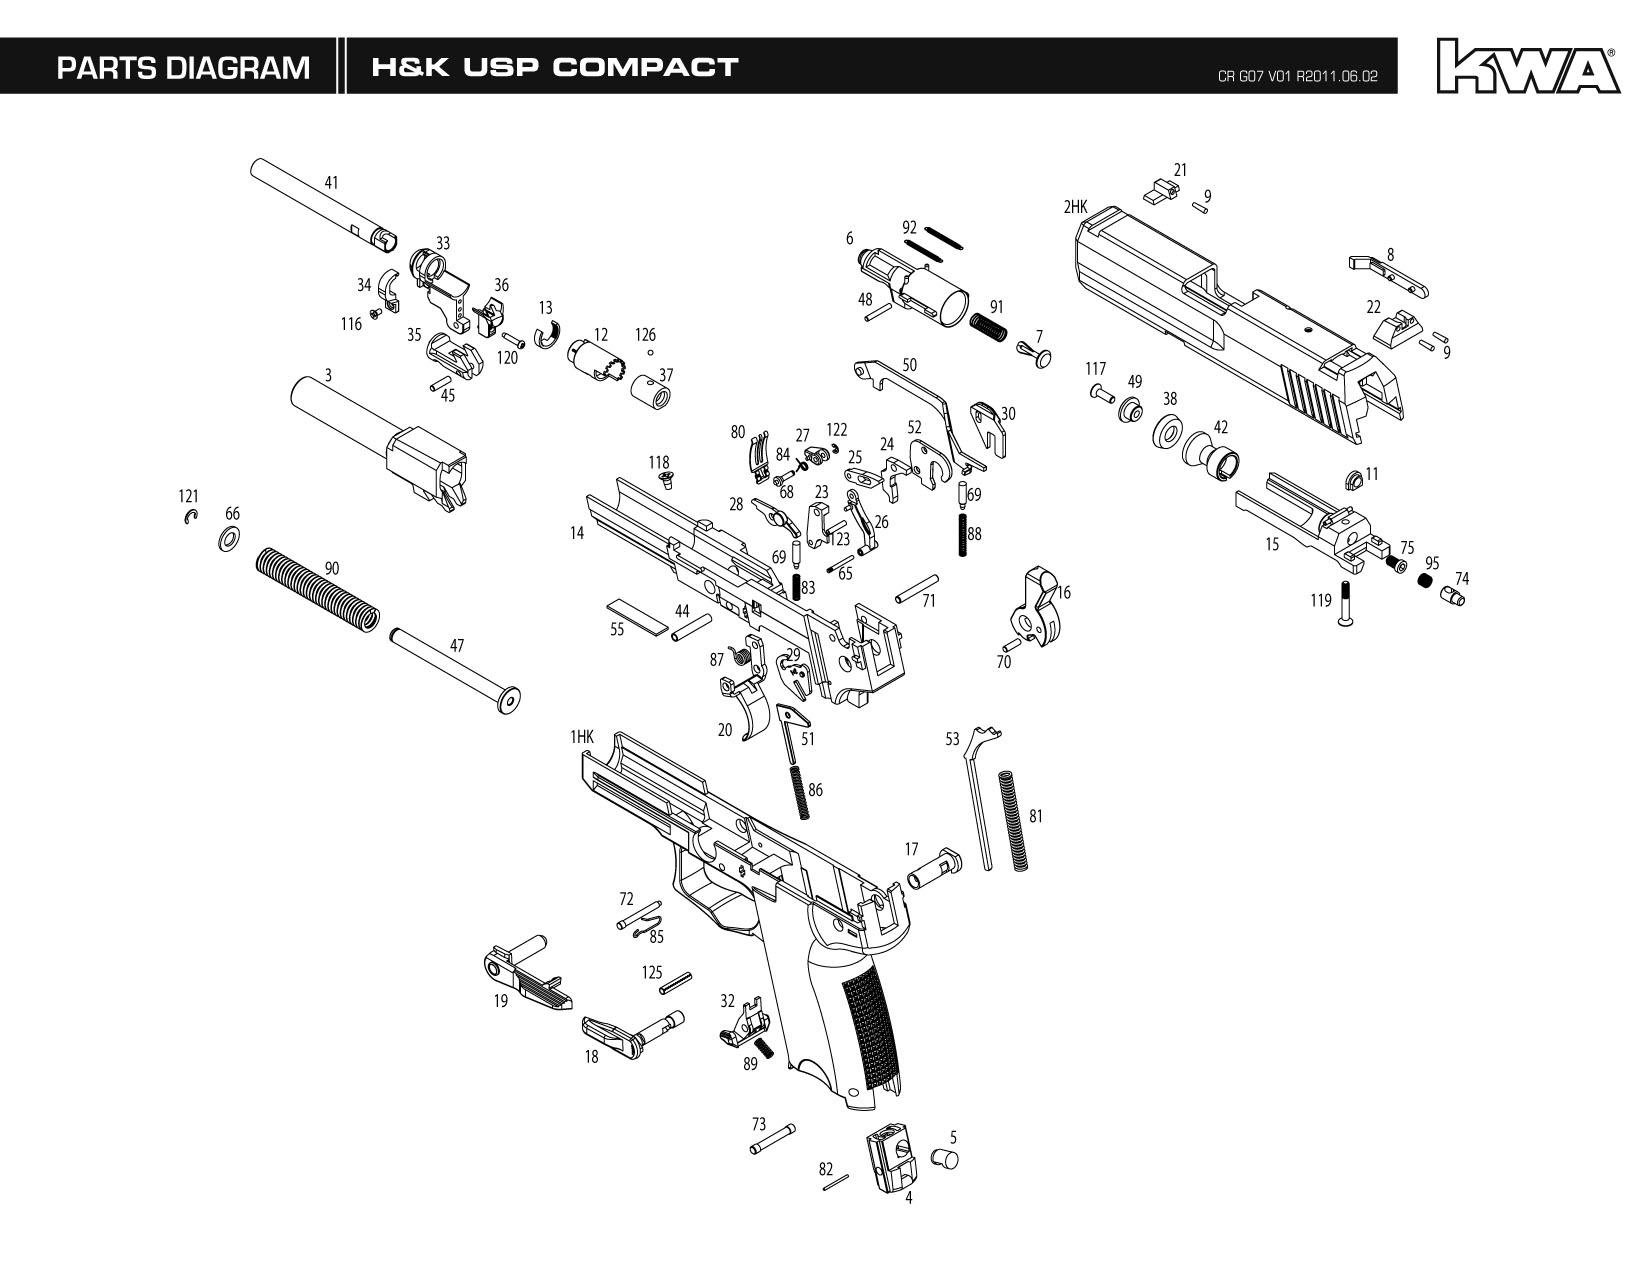 Kwa Gun Manual Usp Compact